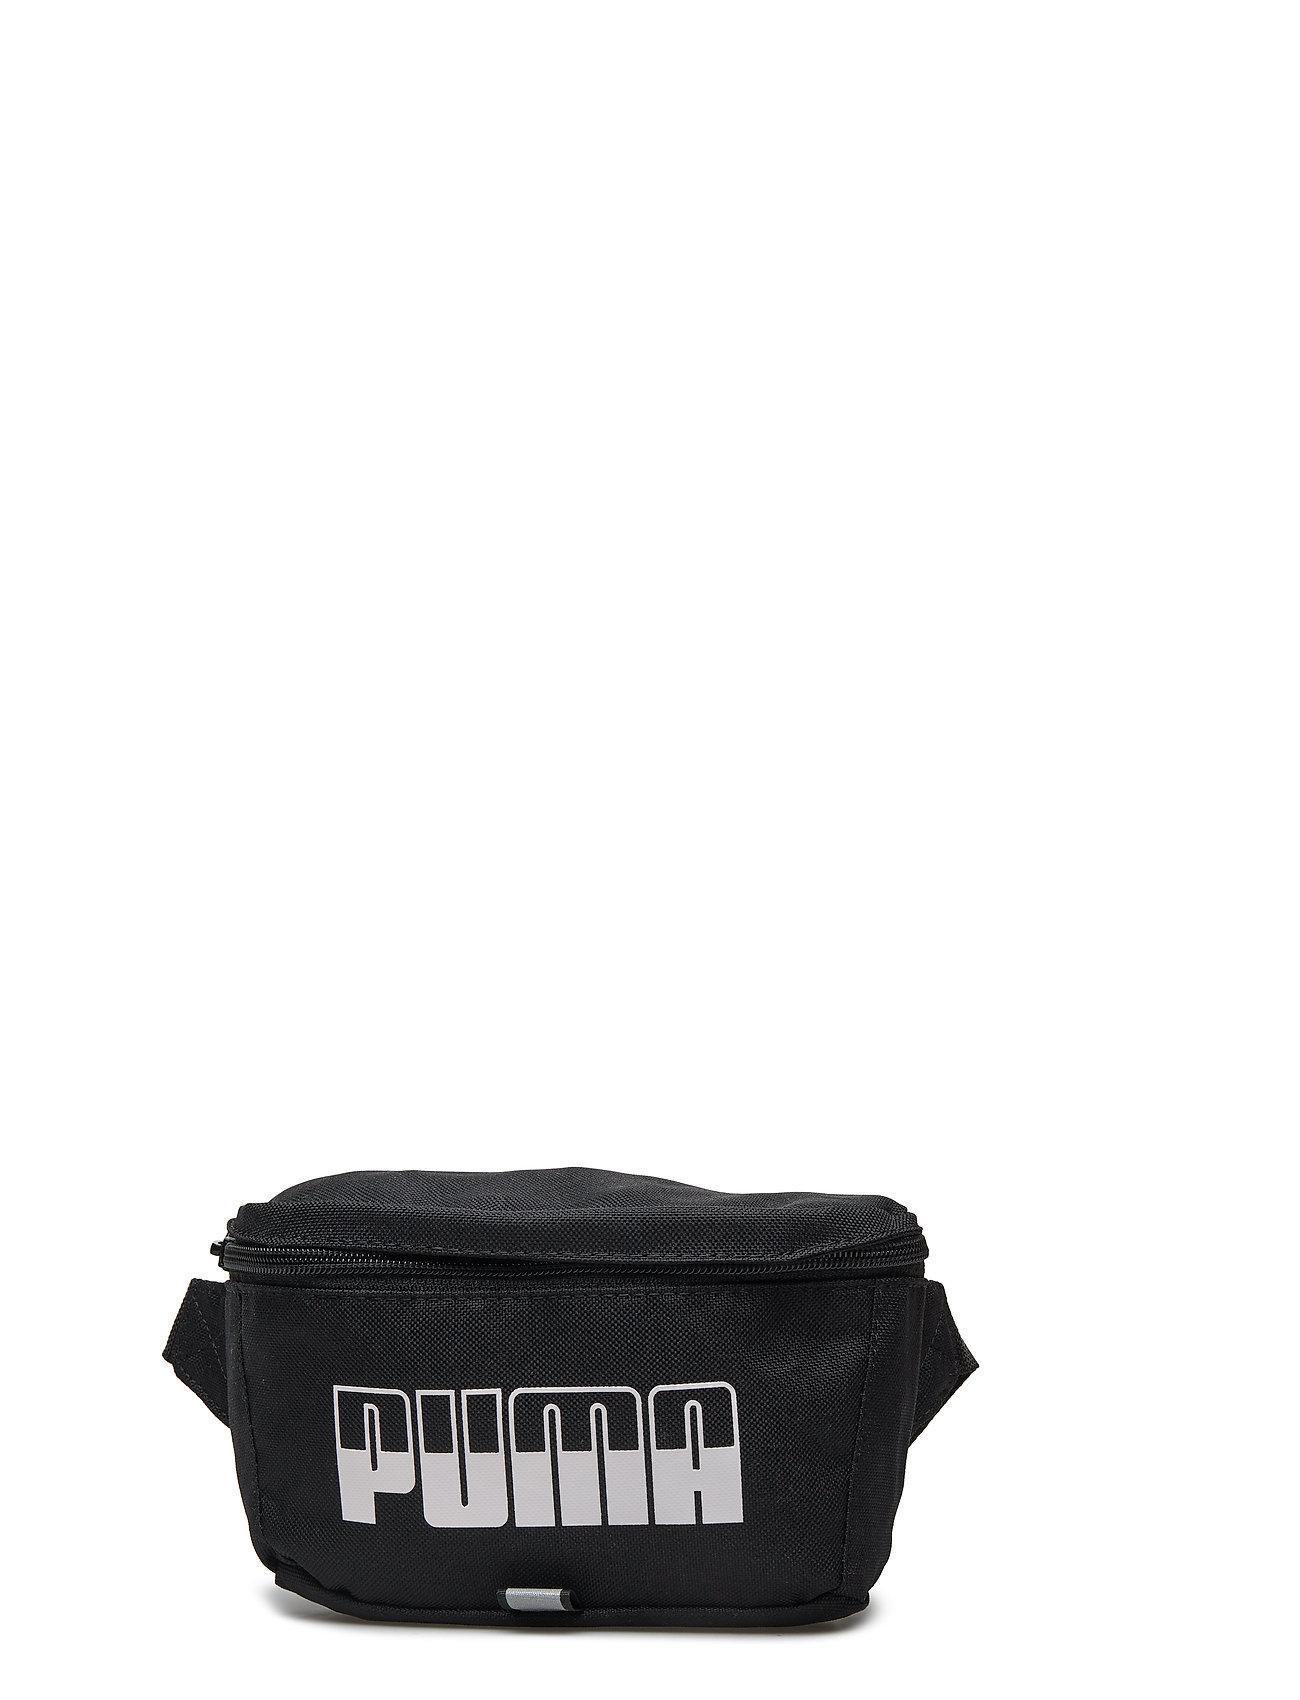 40486e271fab26 Puma Plus Waist Bag Ii (Puma Black) (£24) - PUMA -